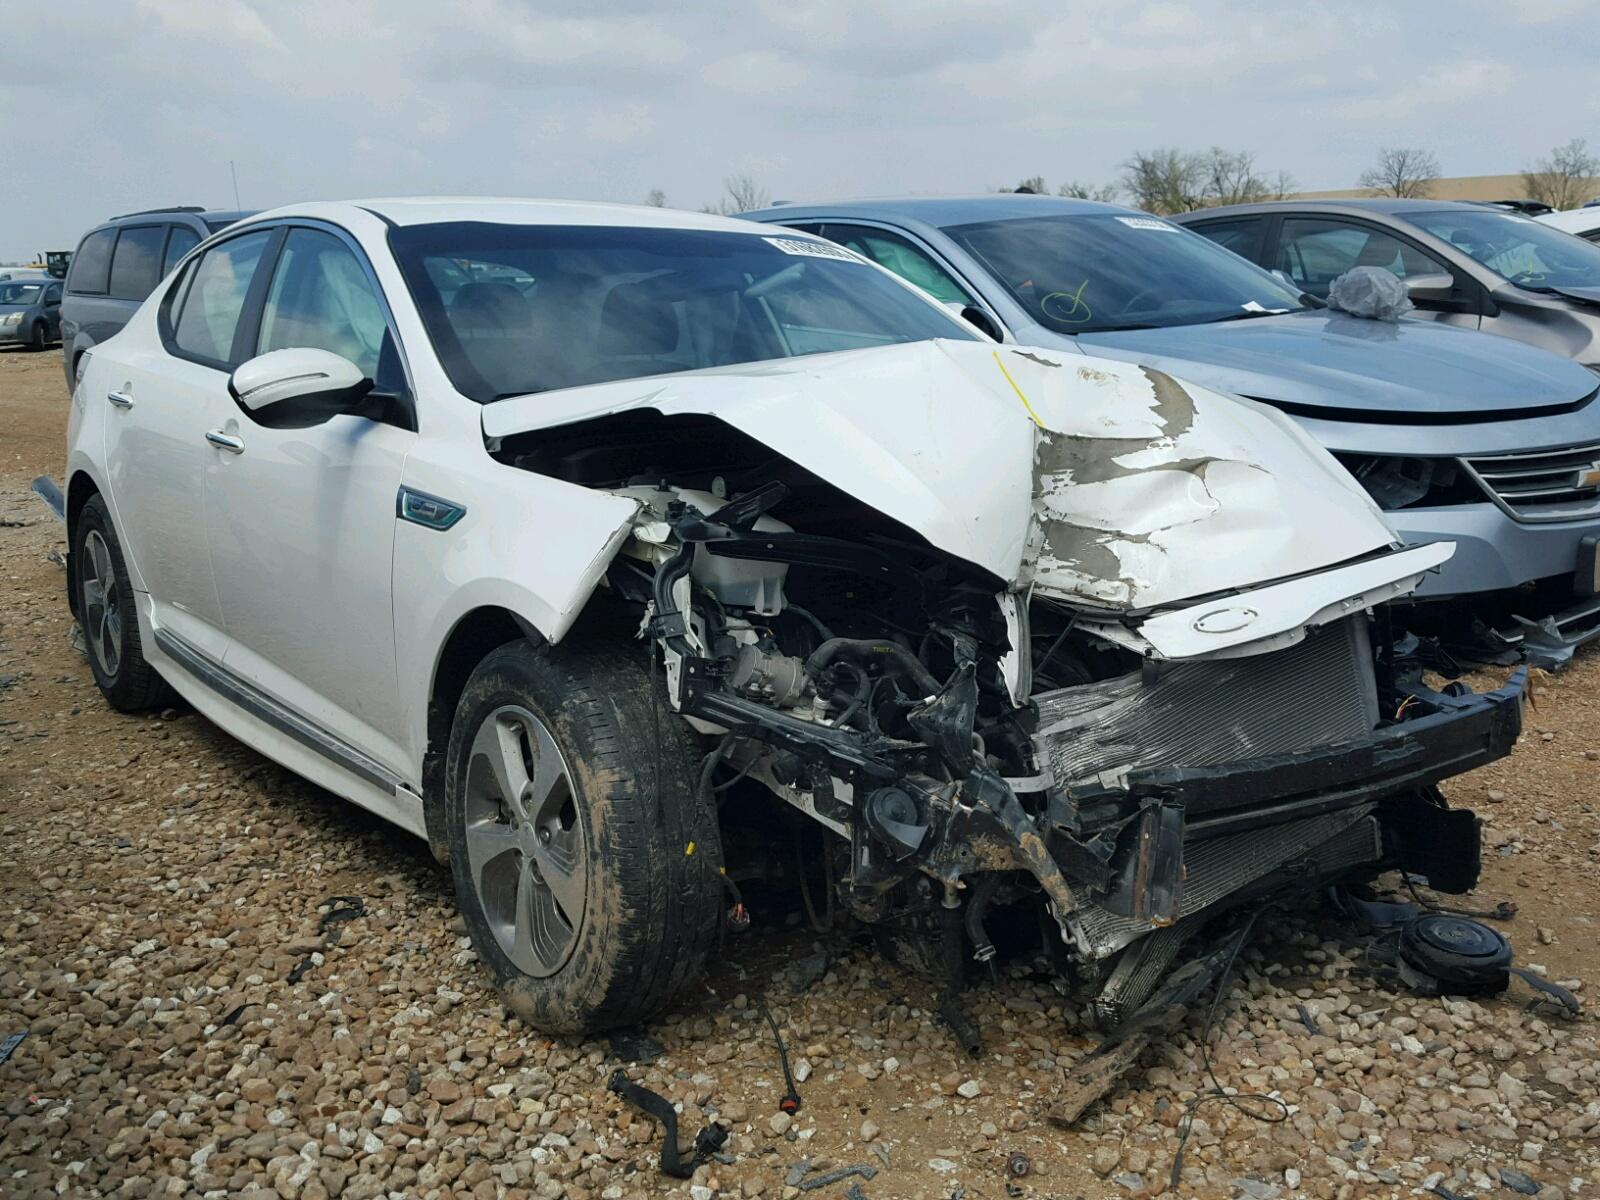 base hybrid sedan shot optima centered groovecar research ex wide kia dash large